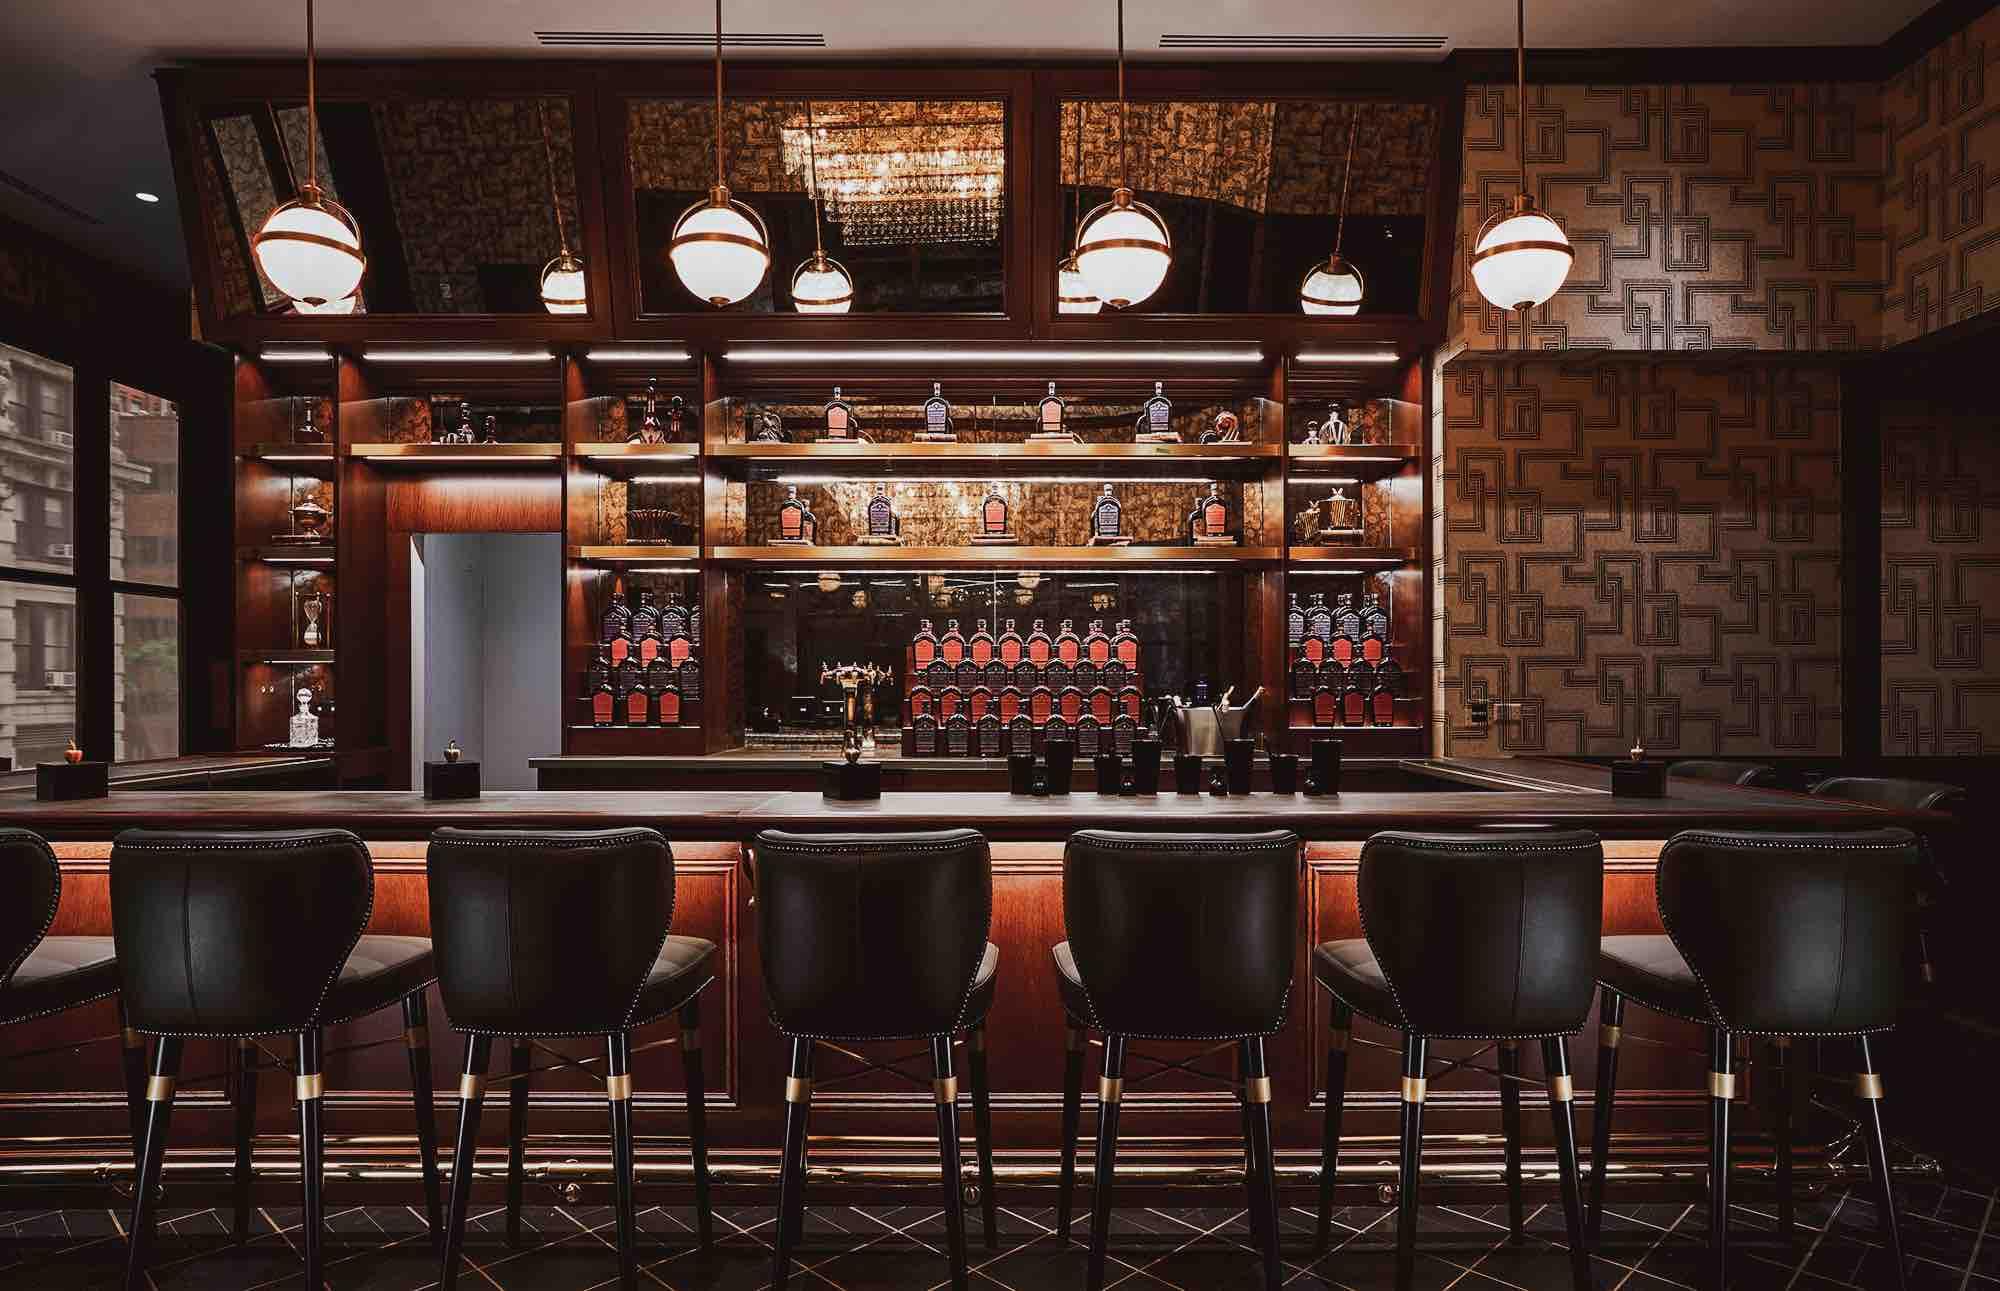 The Tasting Experience At Great Jones Distilling Co Opens Whiskey Distillery in Manhattan's NoHo Neighborhood